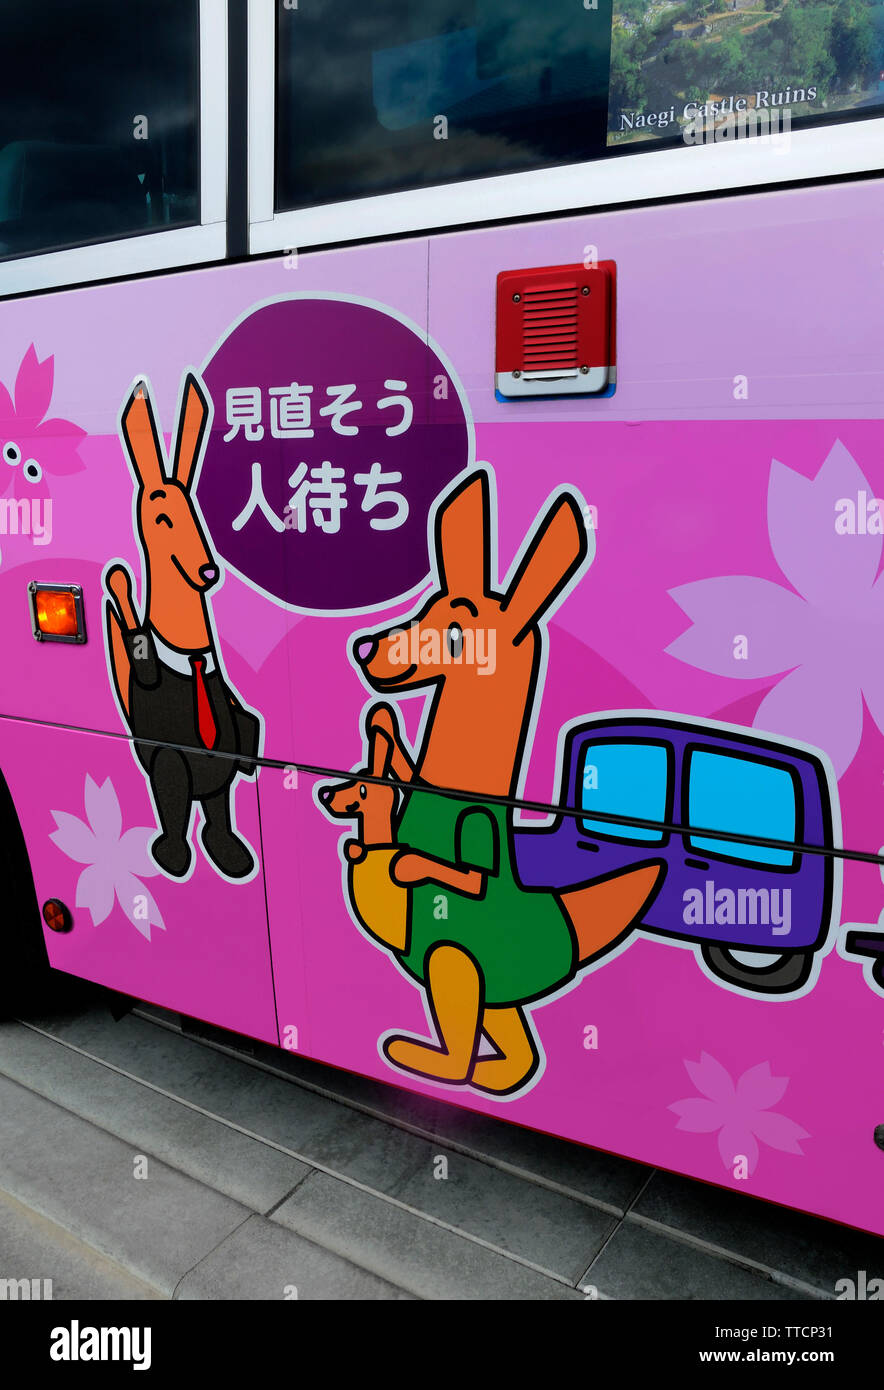 child friendly graphic design on local bus Magome Village Japan - Stock Image